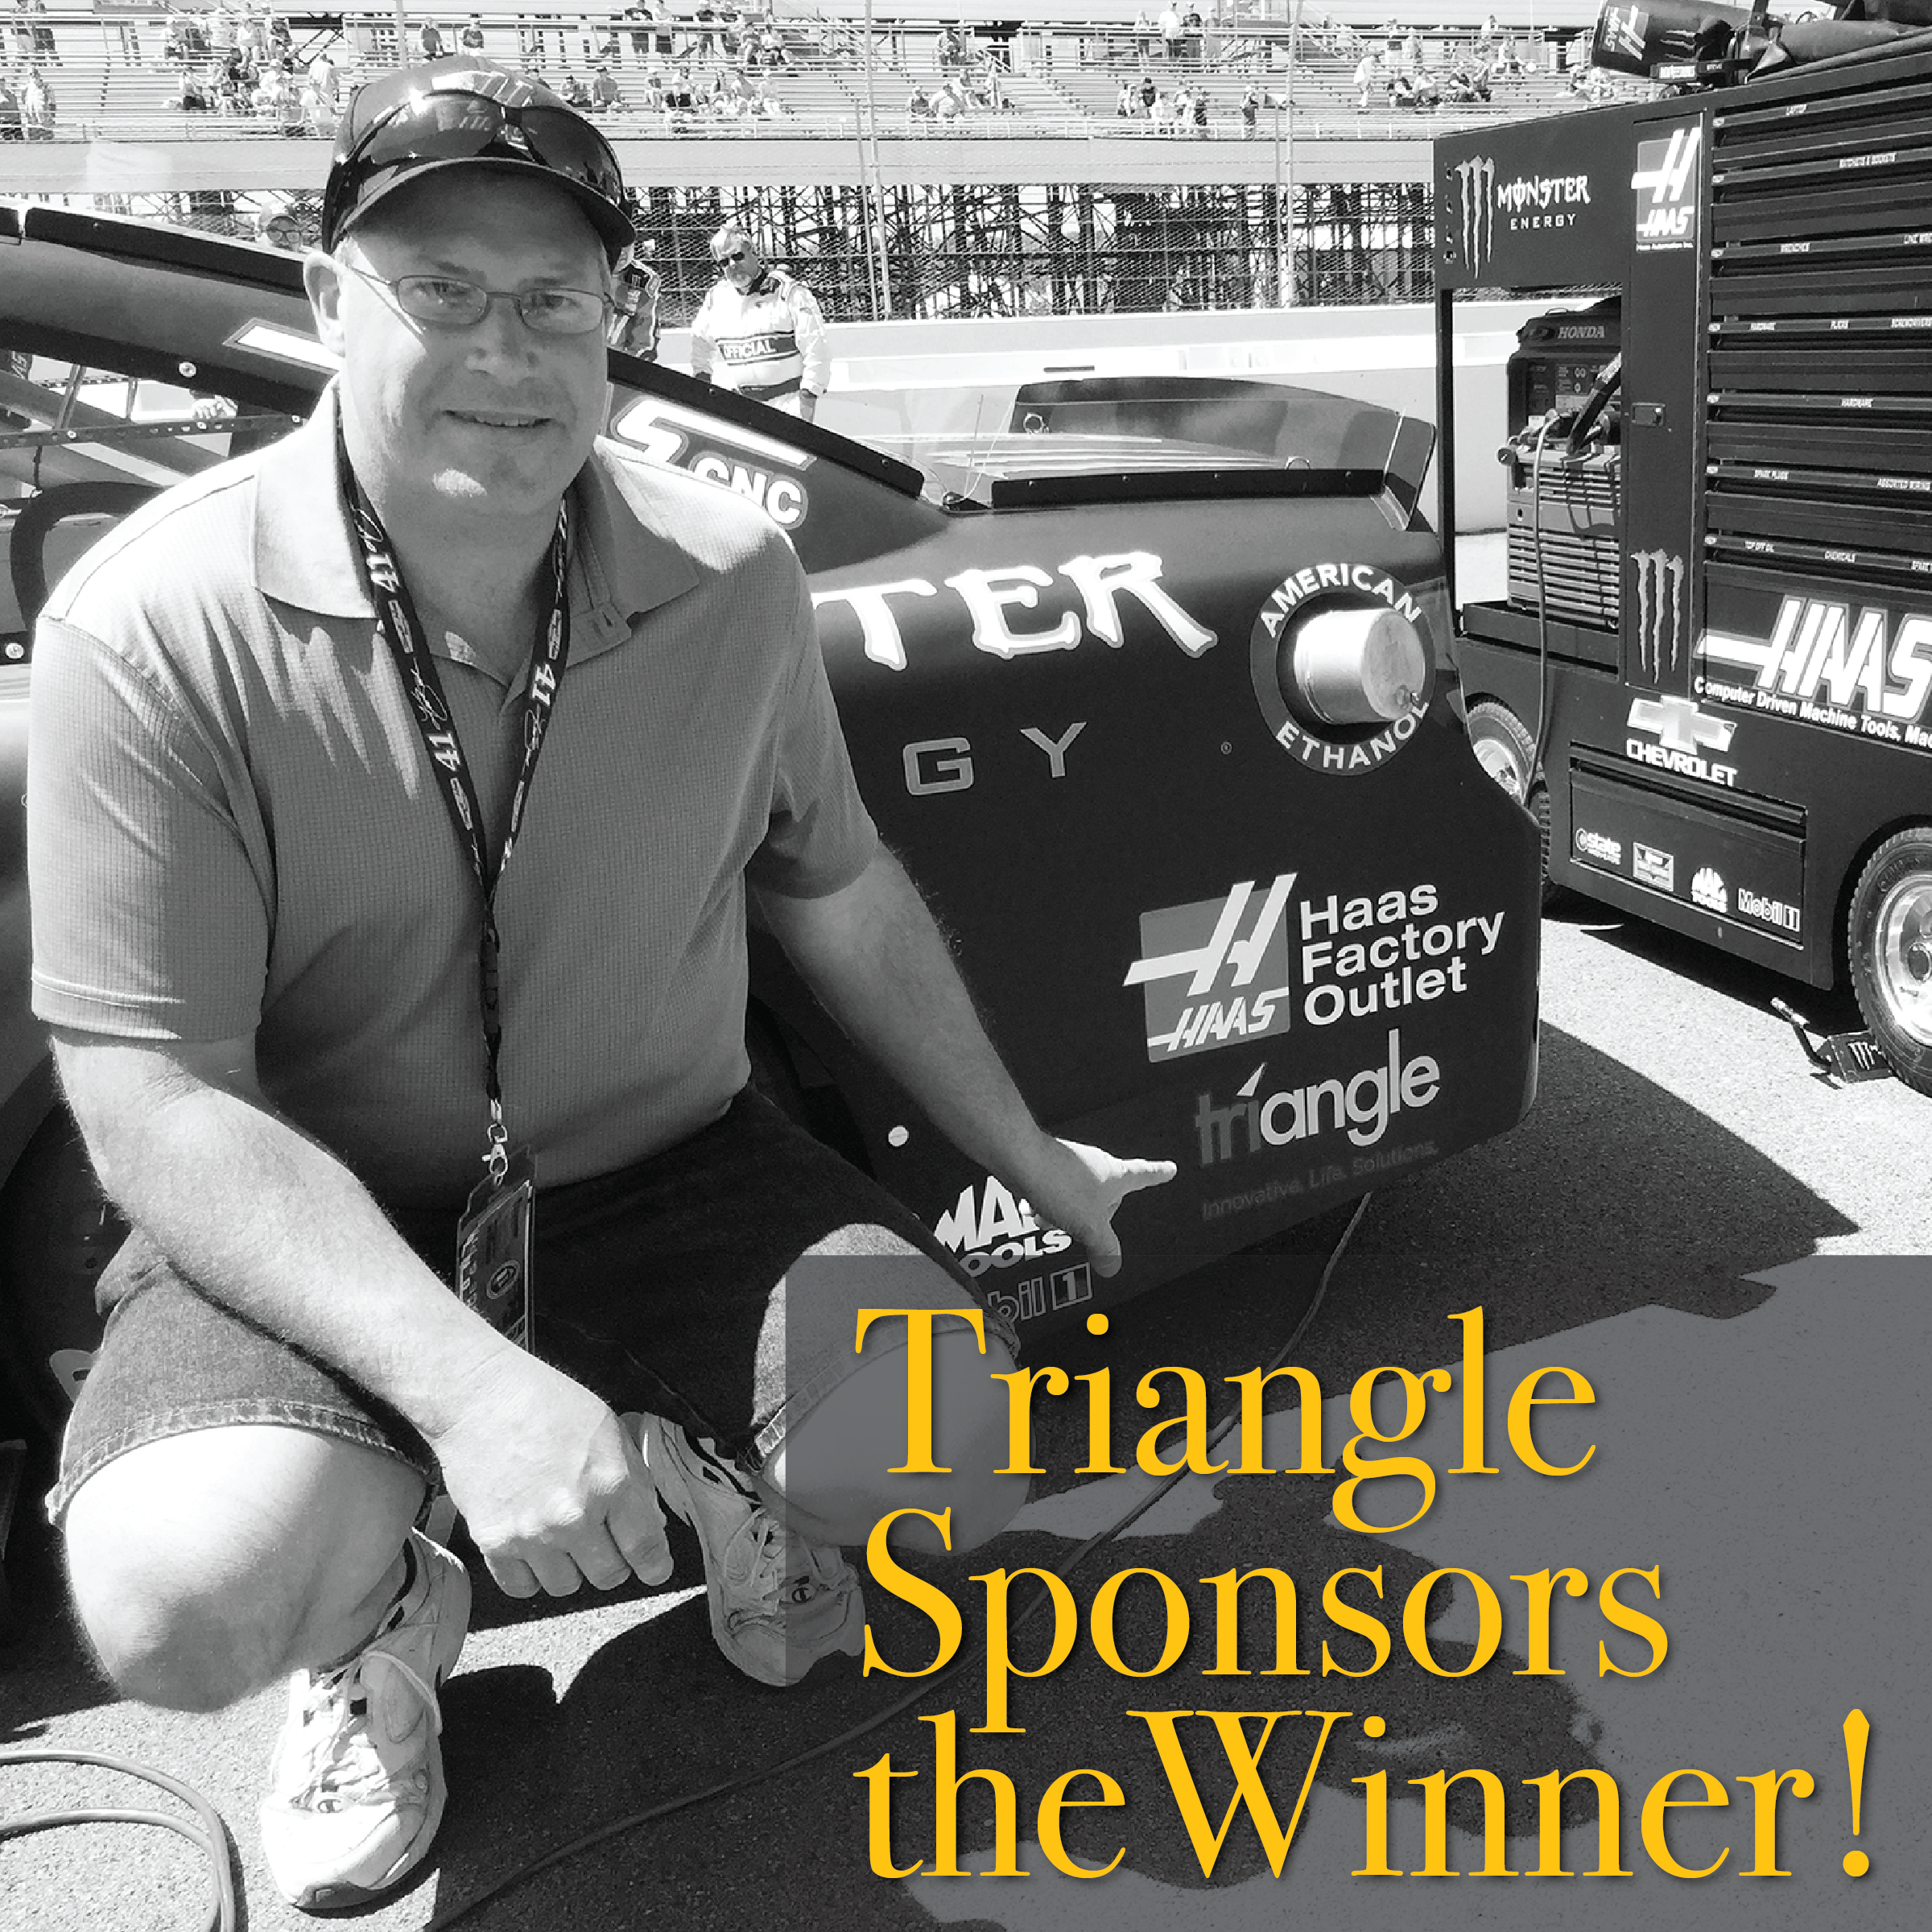 #41 Wins NASCAR Axalta 400 at Pocono Raceway